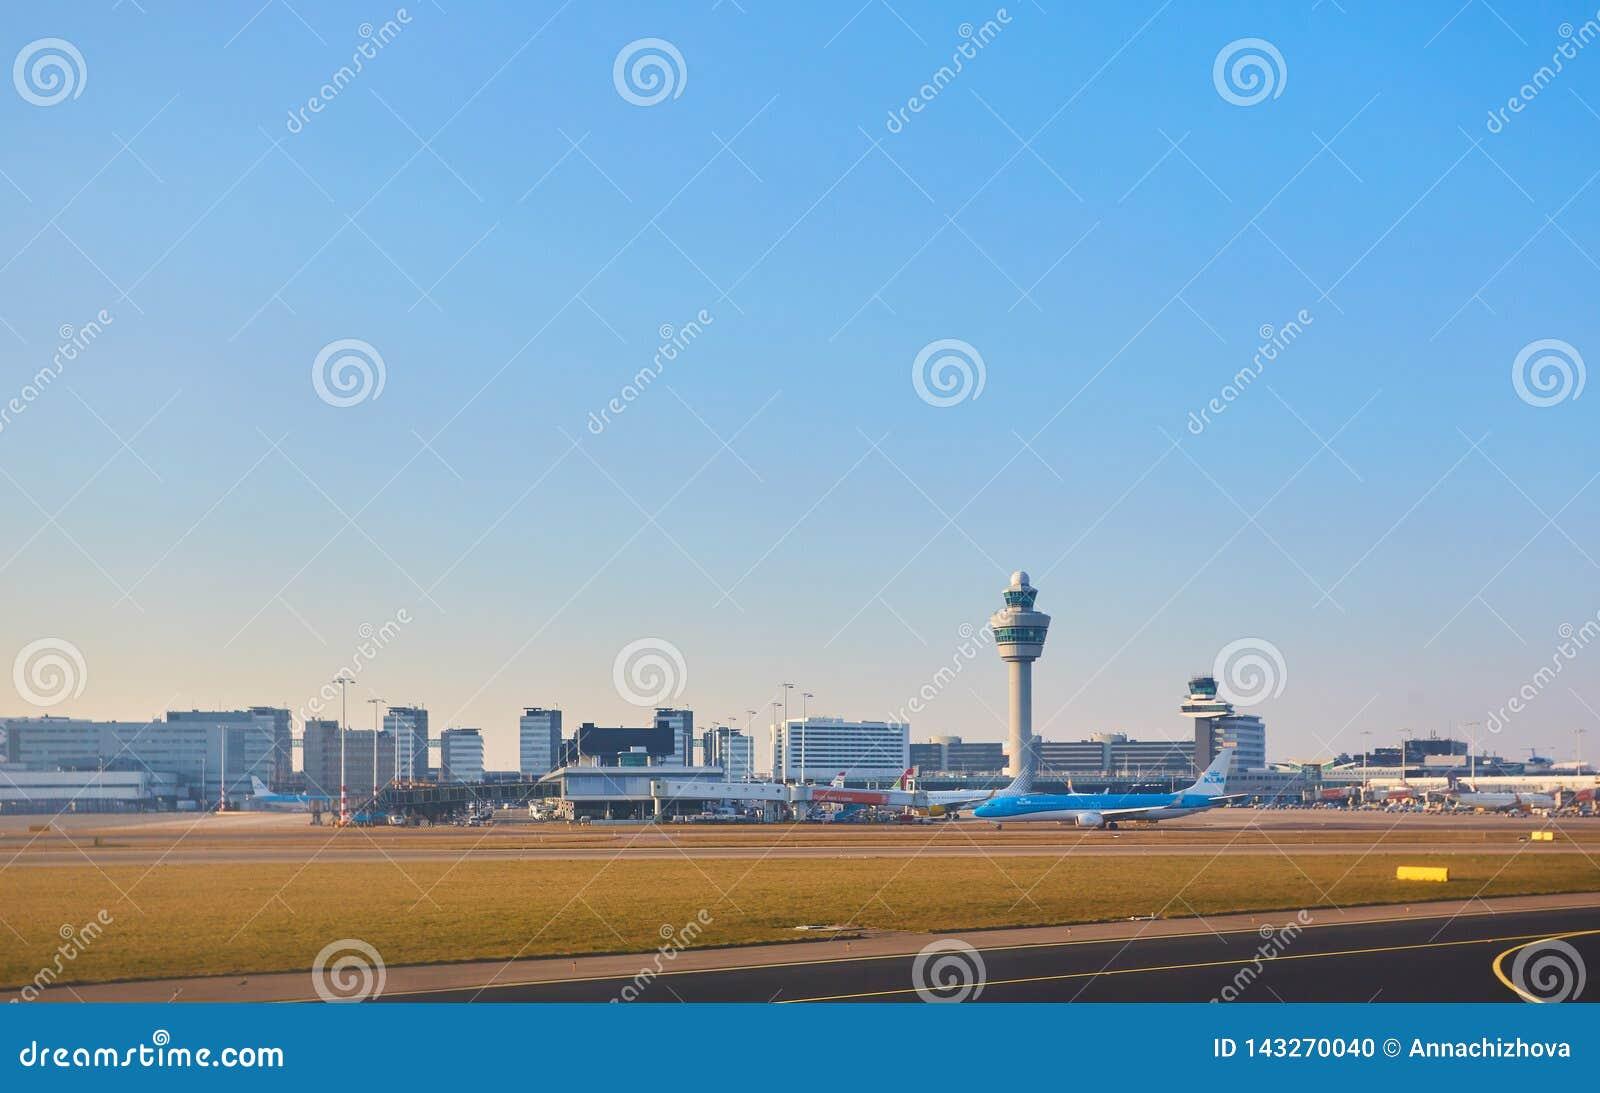 Amsterdam, Netherlands - March 11, 2016: Amsterdam Airport Schiphol in Netherlands. AMS is the Netherlands` main